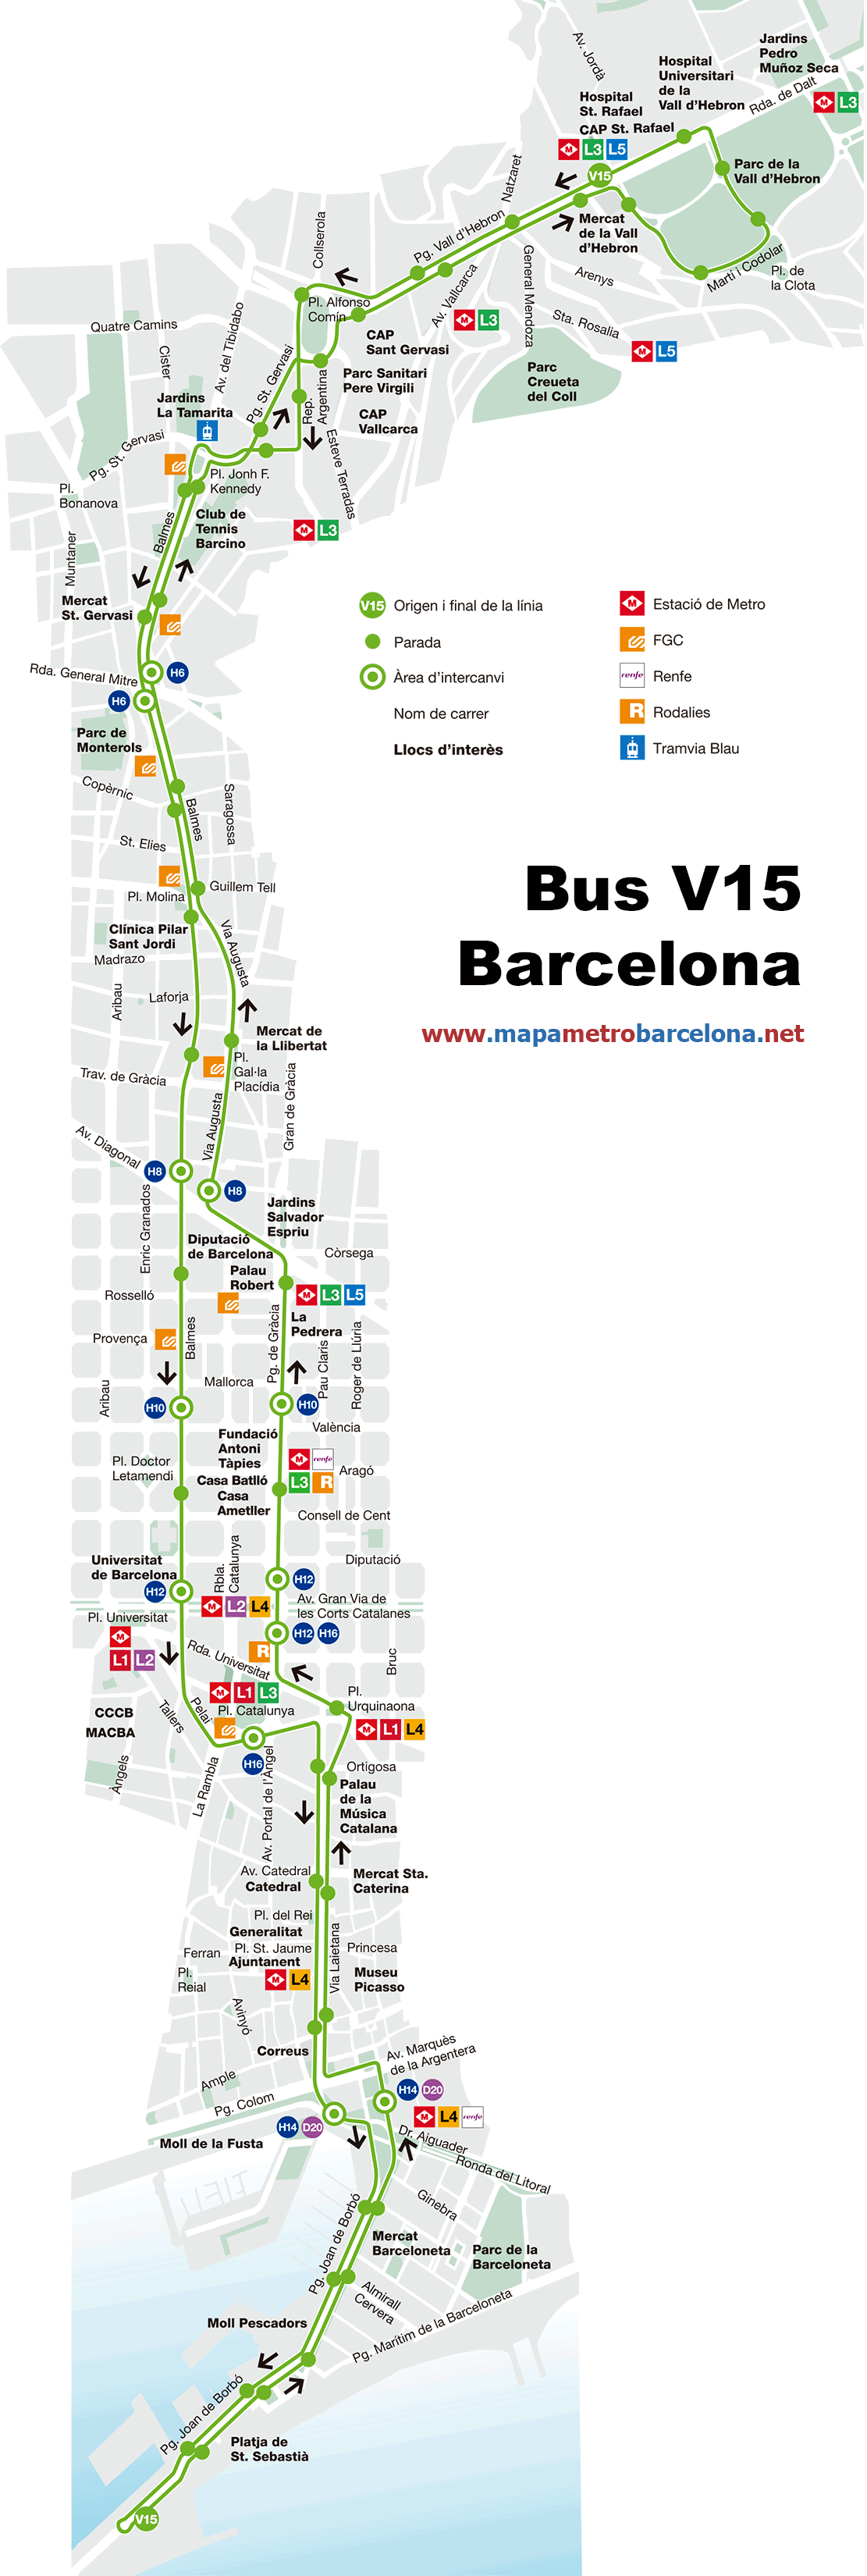 Bus line v15 barceloneta vall hebron barcelona map for Linea barcelona